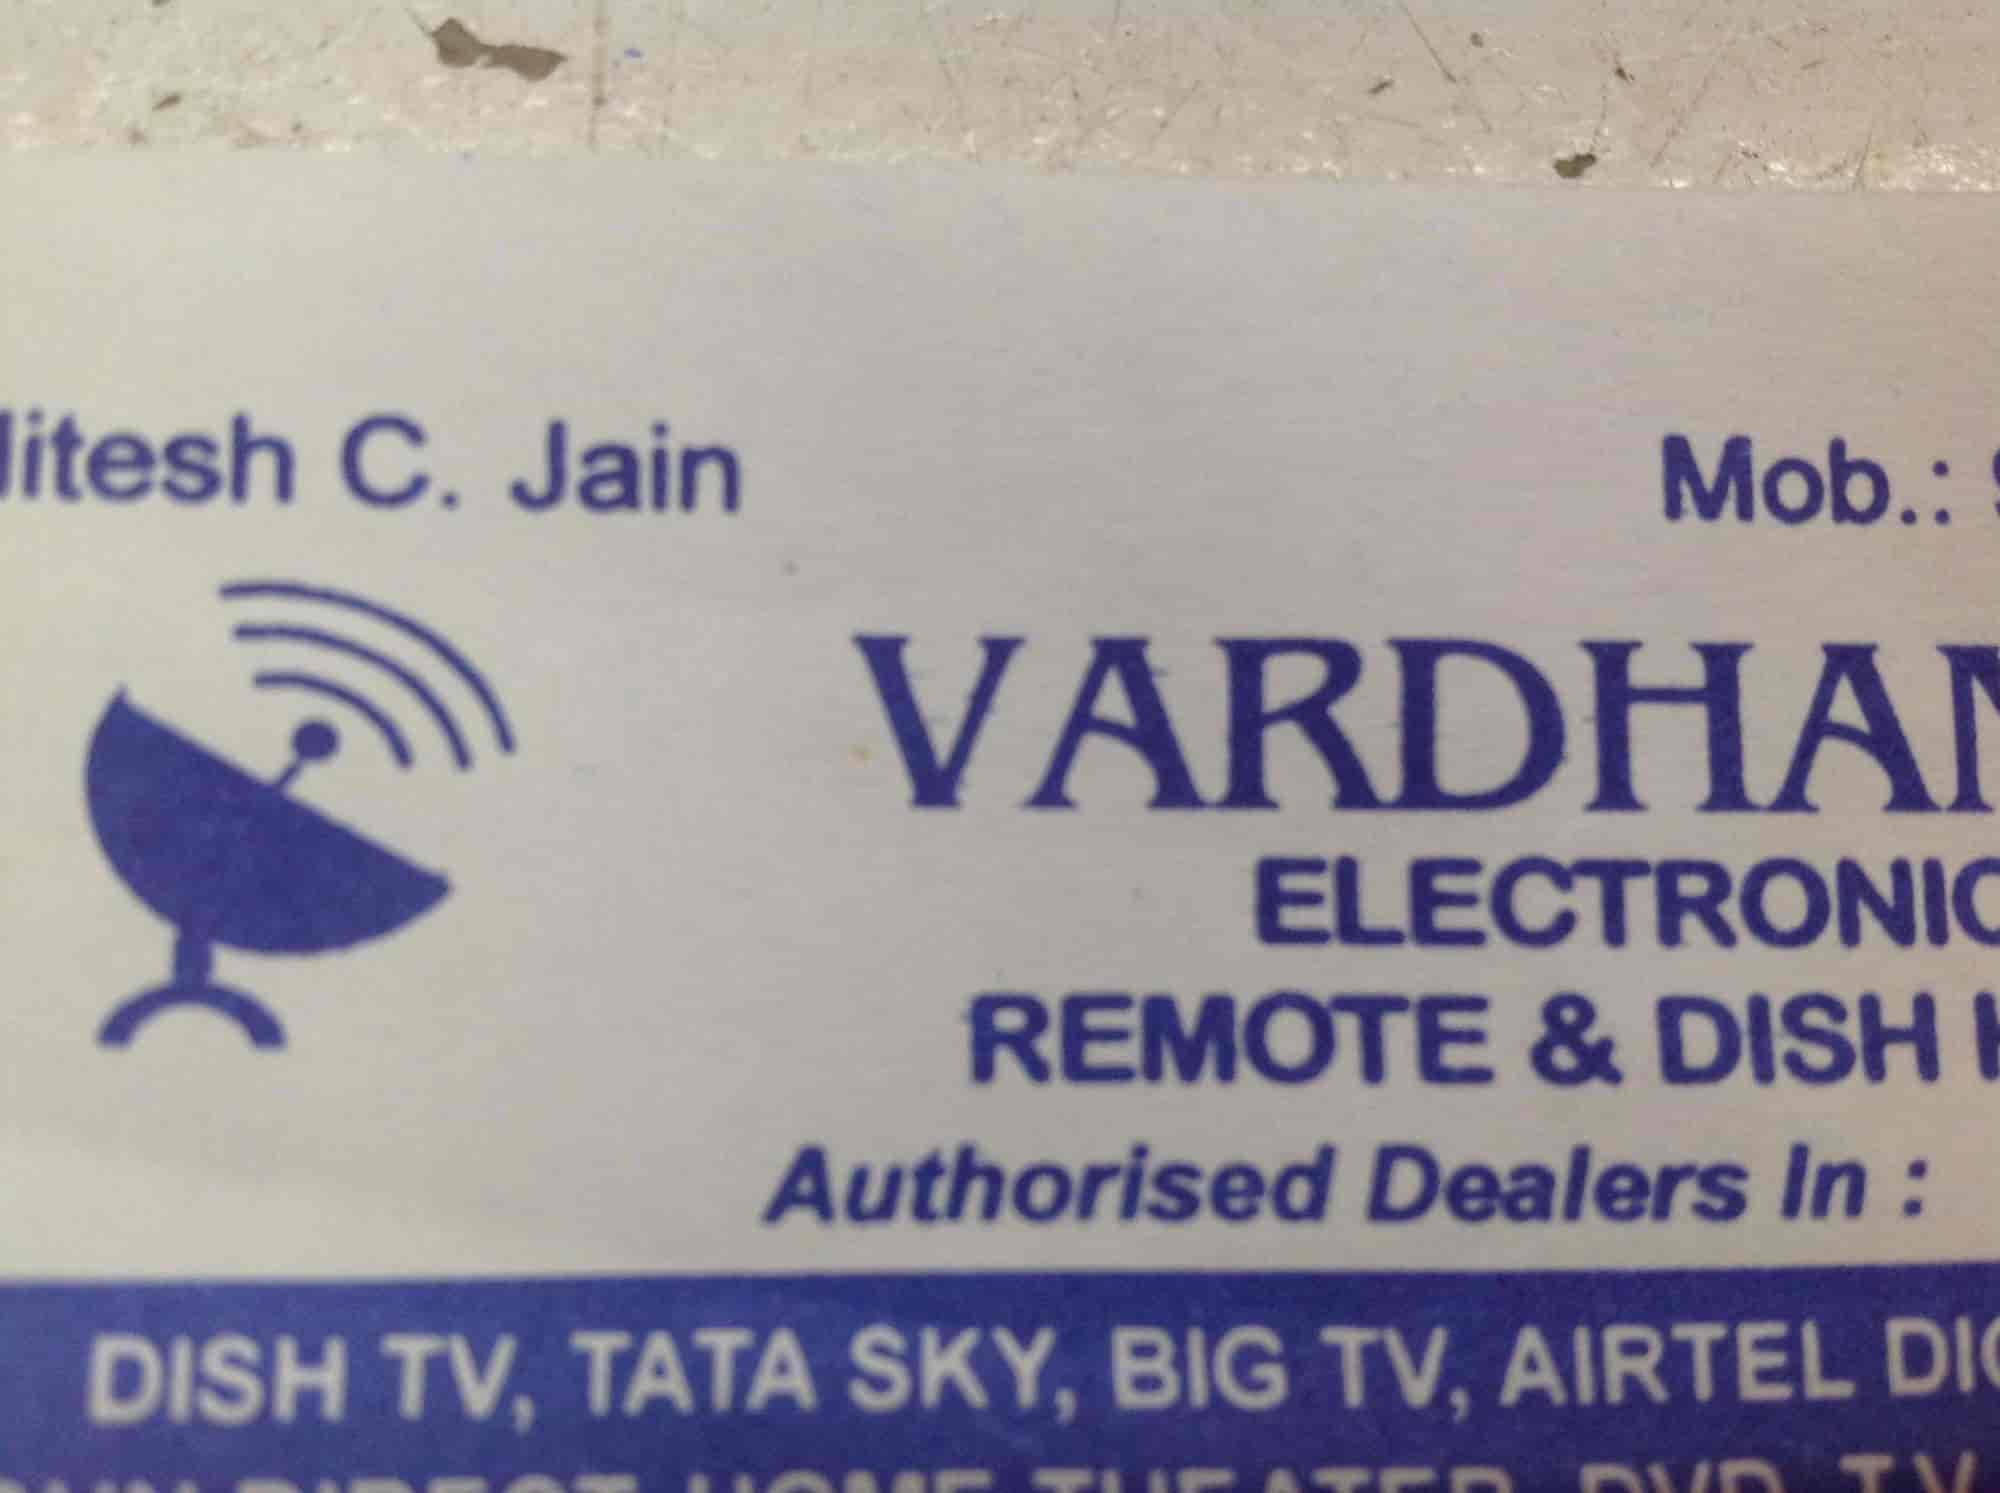 Vardhaman Electronics Remote & Dish House Virar West Vardhman